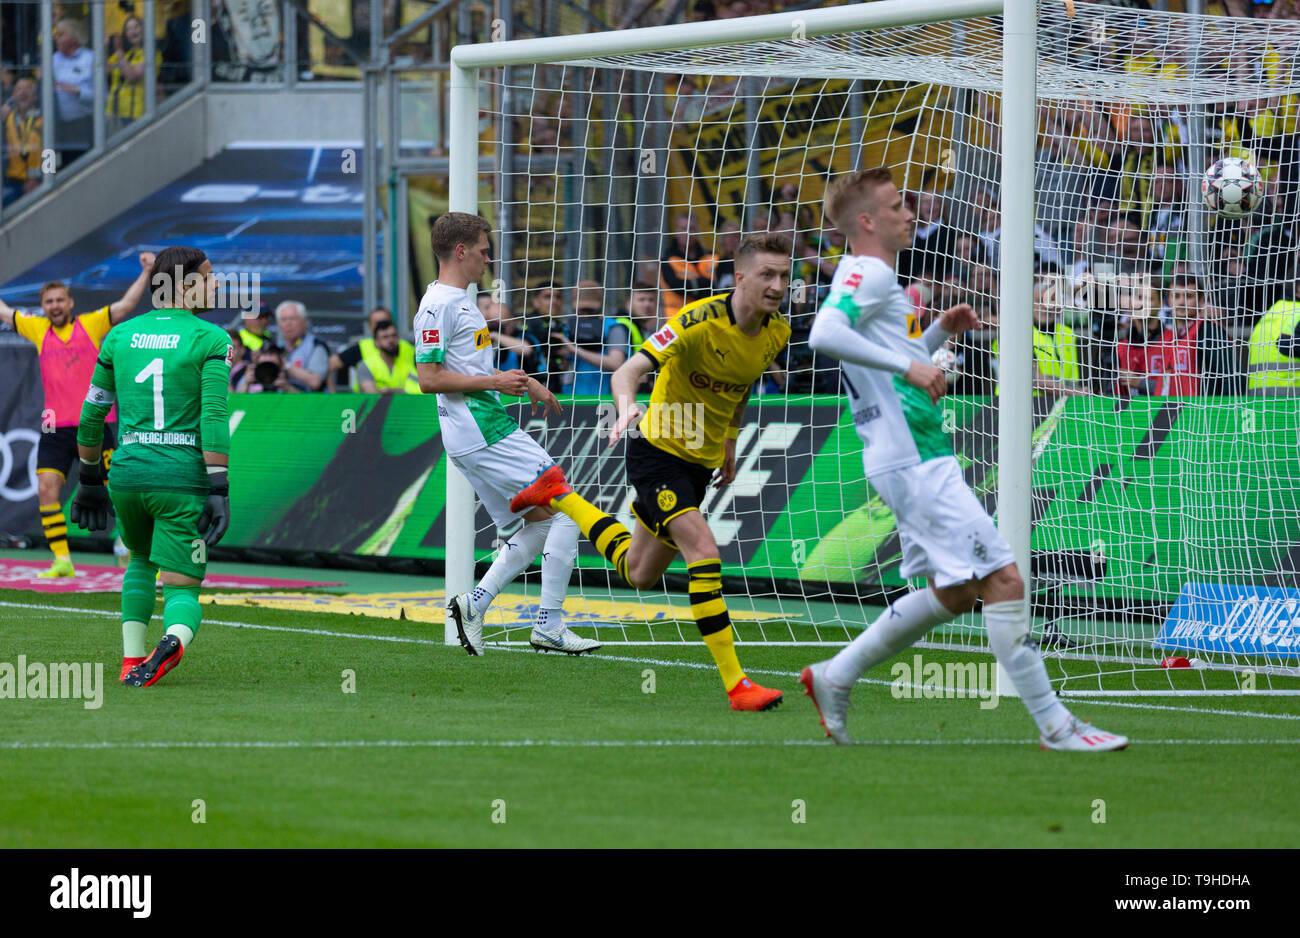 Sport, Fussball, Bundesliga, 2018/2019, Borussia Moenchengladbach vs. BVB Borussia Dortmund 0-2, Stadion Borussia-Park, Tor zum 0-2, v.l.n.r. Torwart Yann Sommer (MG), Matthias Ginter (MG), Torschuetze Marco Reus (BVB), Oscar Wendt (MG), DFL REGULATIONS PROHIBIT ANY USE OF PHOTOGRAPHS AS IMAGE SEQUENCES AND/OR QUASI-VIDEO, sports, football, Bundesliga, 2018/2019, Borussia Moenchengladbach vs. BVB Borussia Dortmund 0-2, Stadium Borussia Park, 0-2 goal, f.l.t.r. keeper Yann Sommer (MG), Matthias Ginter (MG), goal scorer Marco Reus (BVB), Oscar Wendt (MG), DFL REGULATIONS PROHIBIT ANY USE OF PHOT - Stock Image